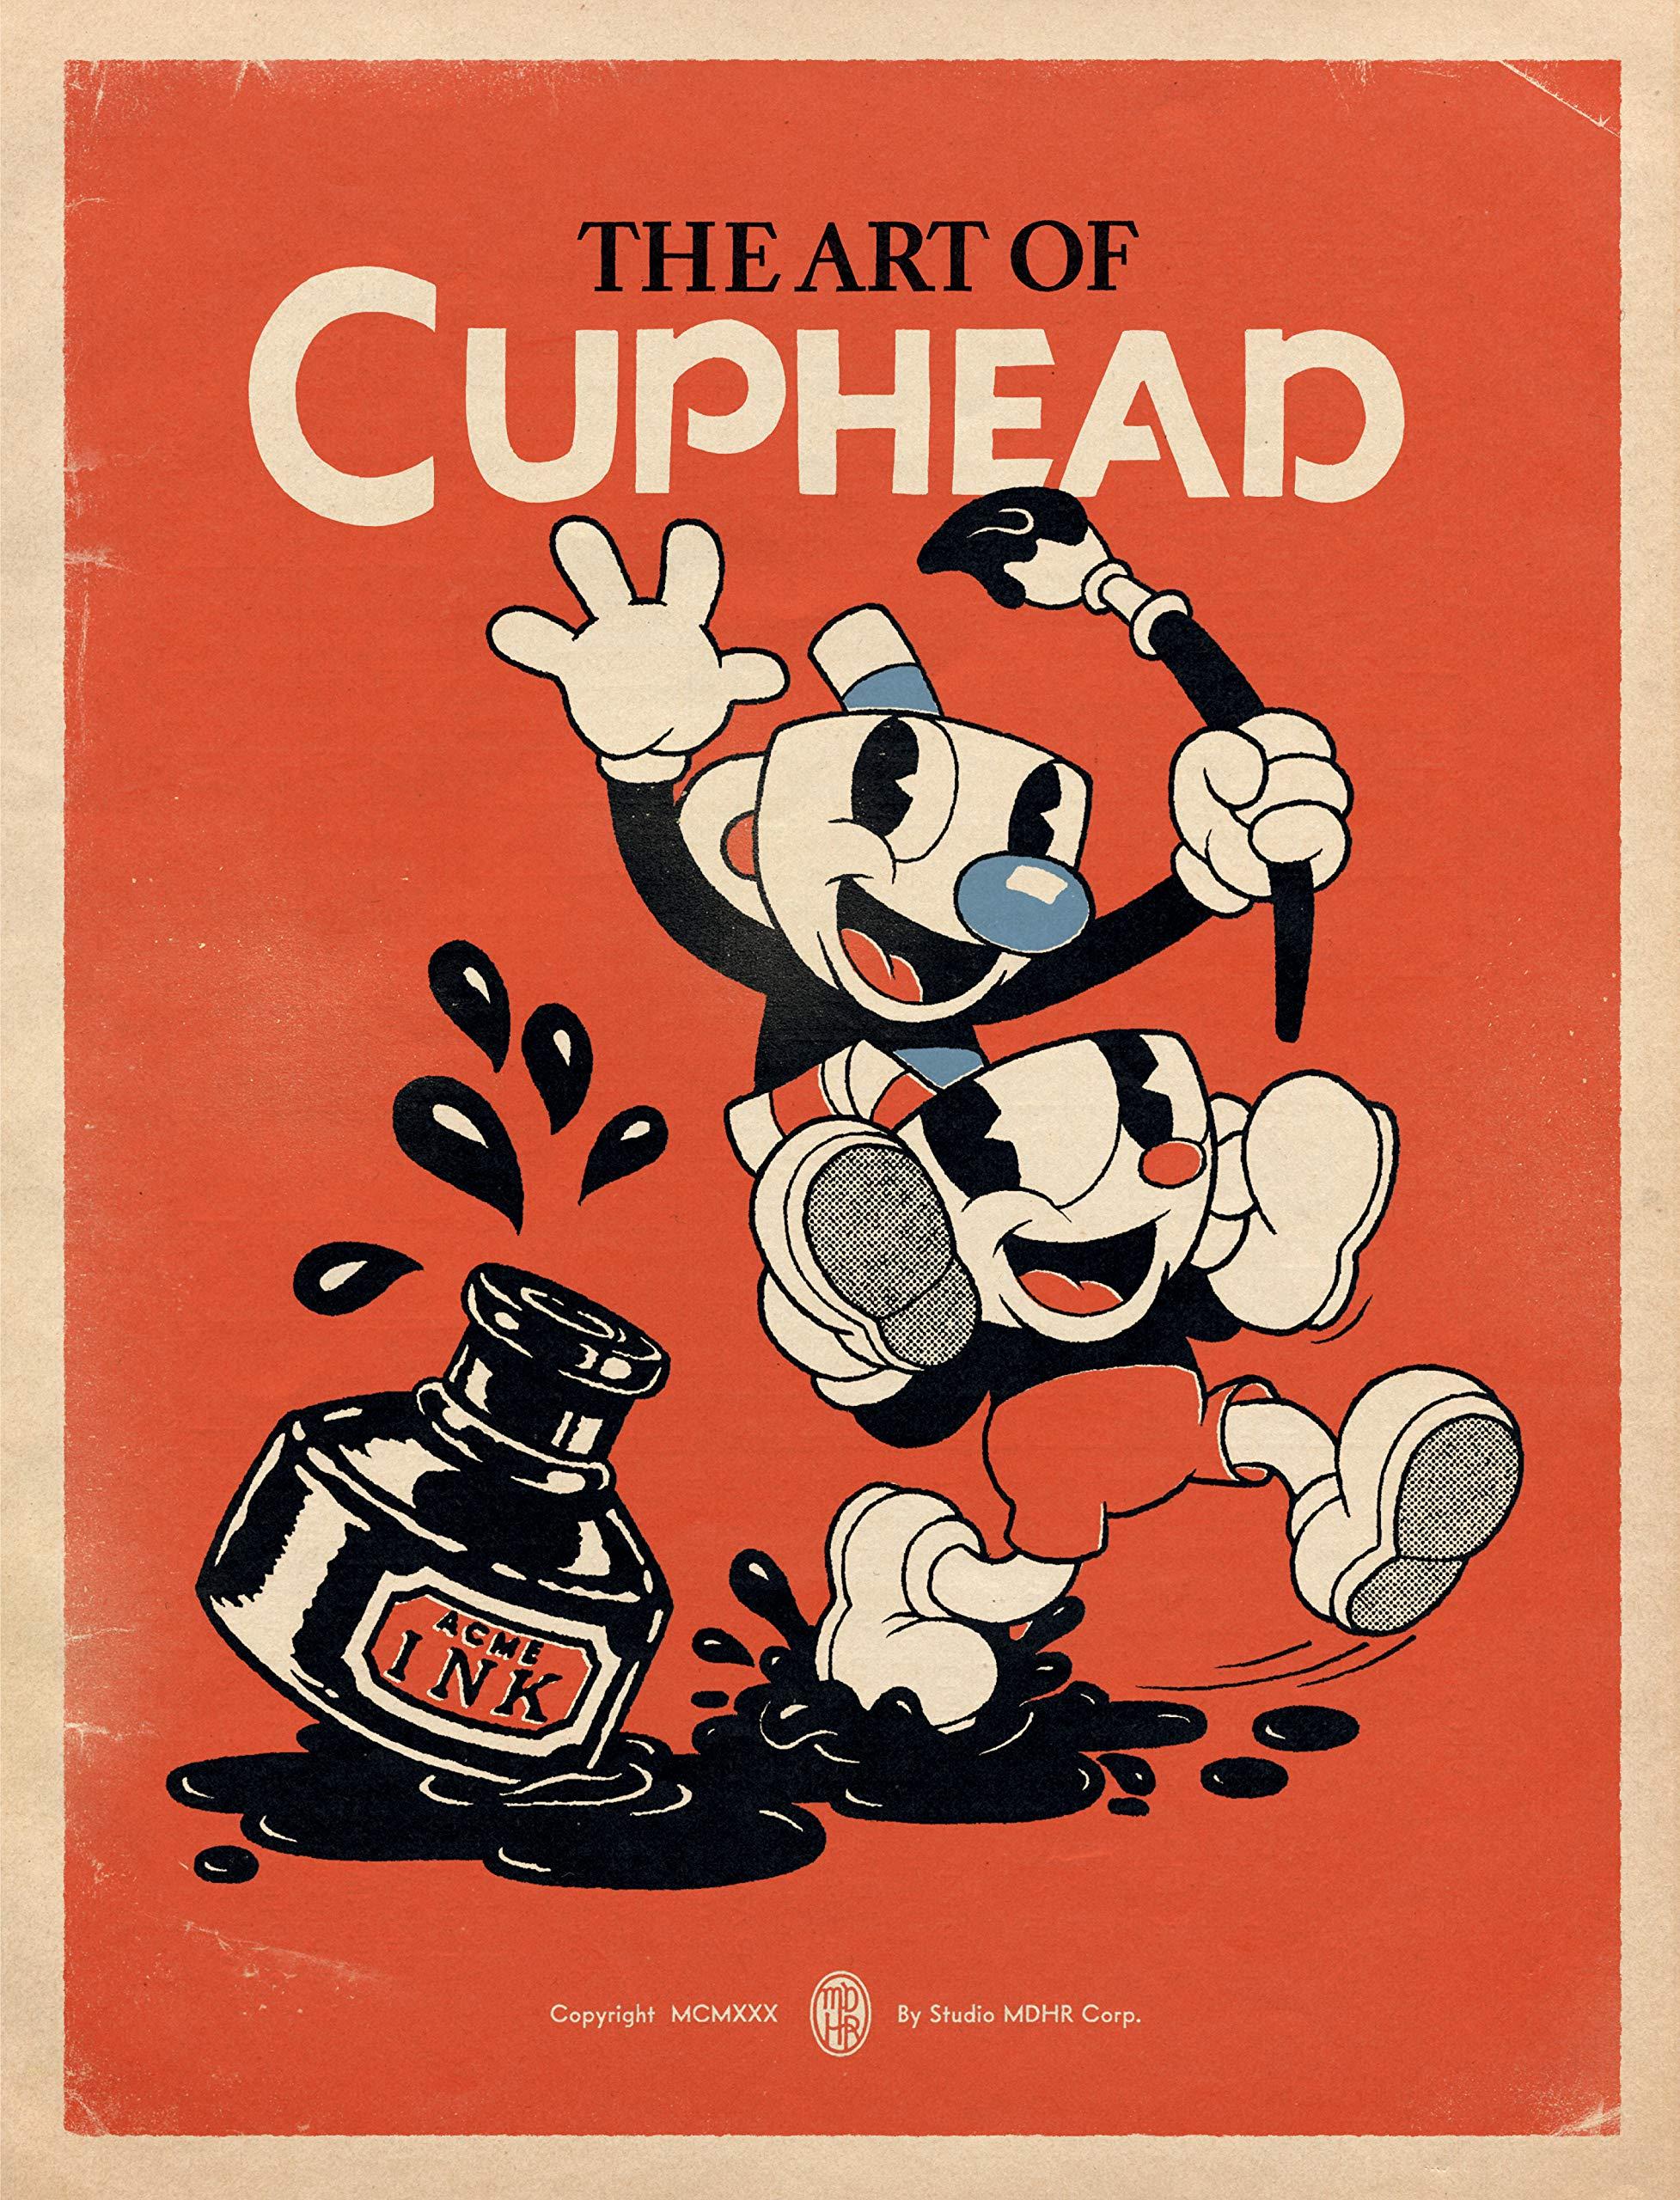 Amazon Com The Art Of Cuphead 9781506713205 Studio Mdhr